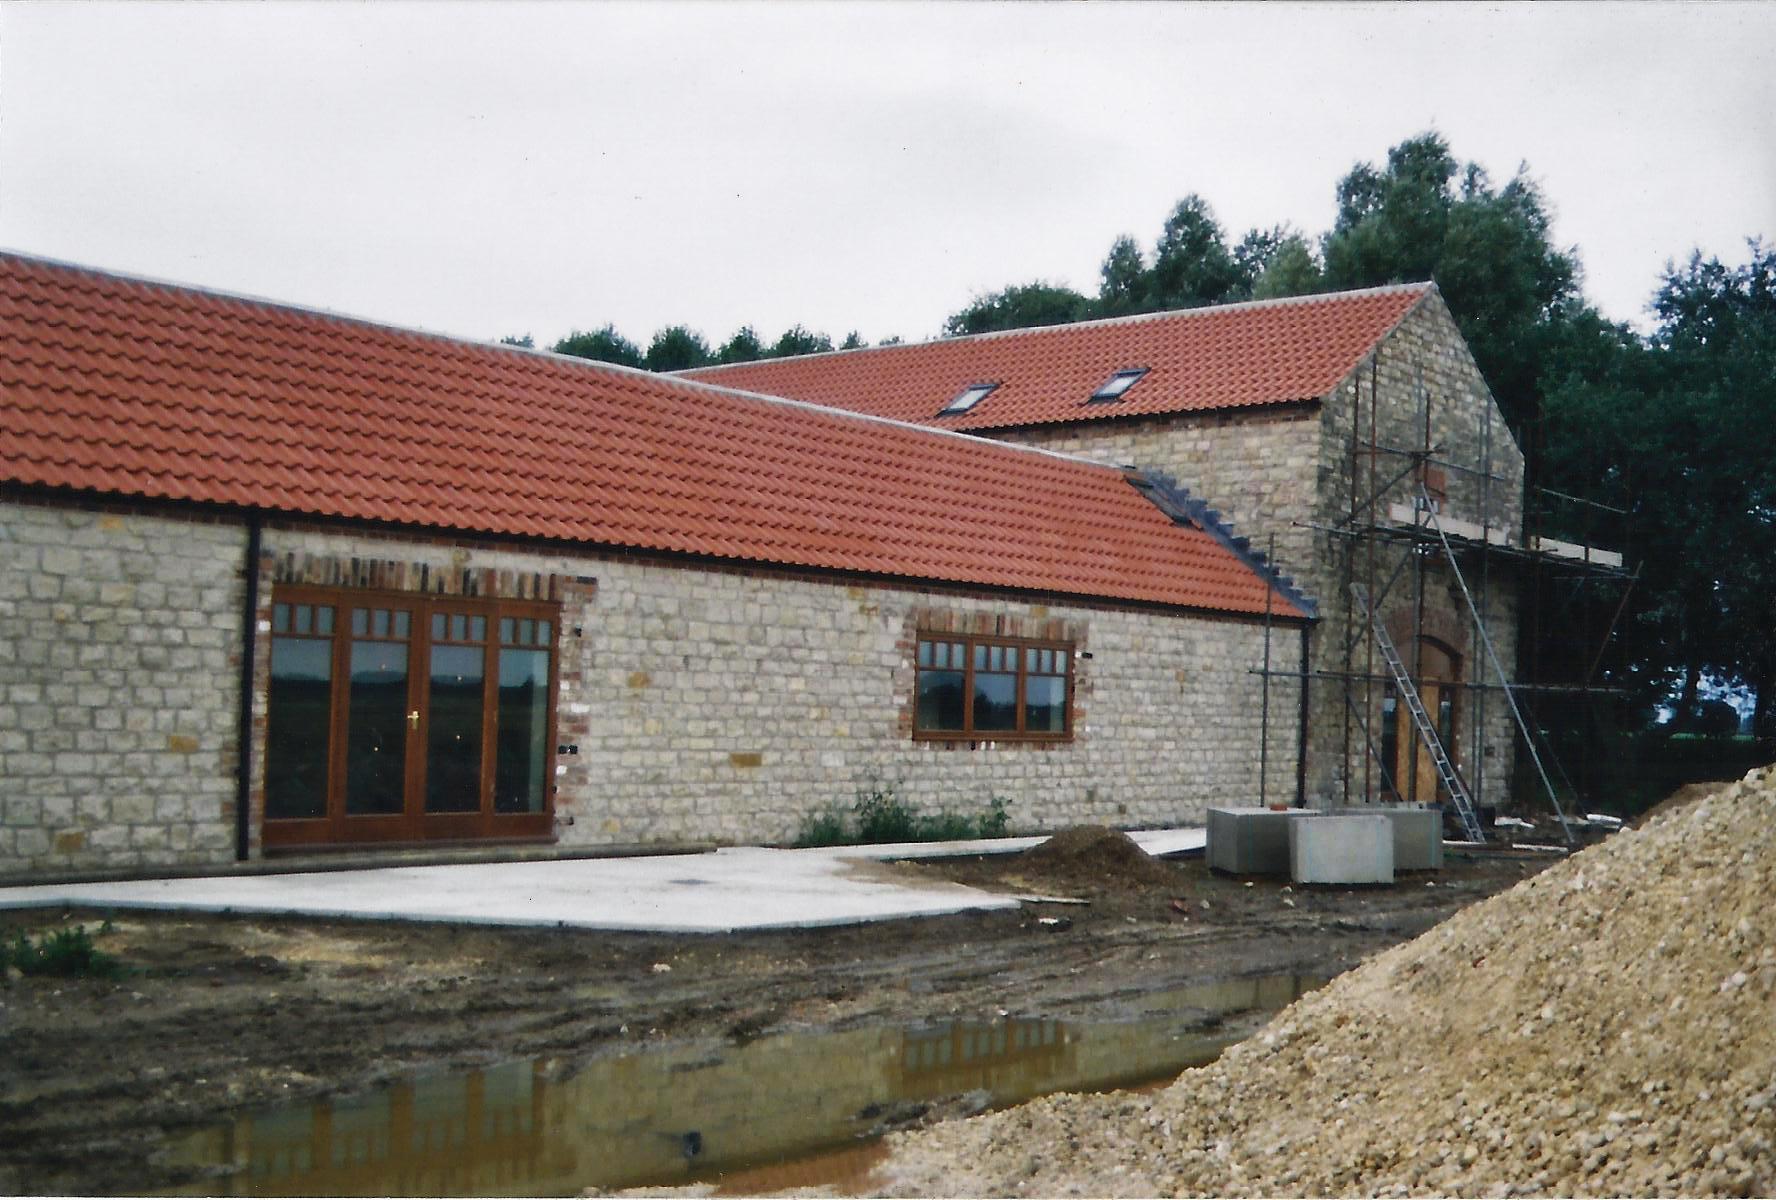 Brecks Farm Construction 4 - East Yorkshire Architects - Samuel Kendall Associates.jpg